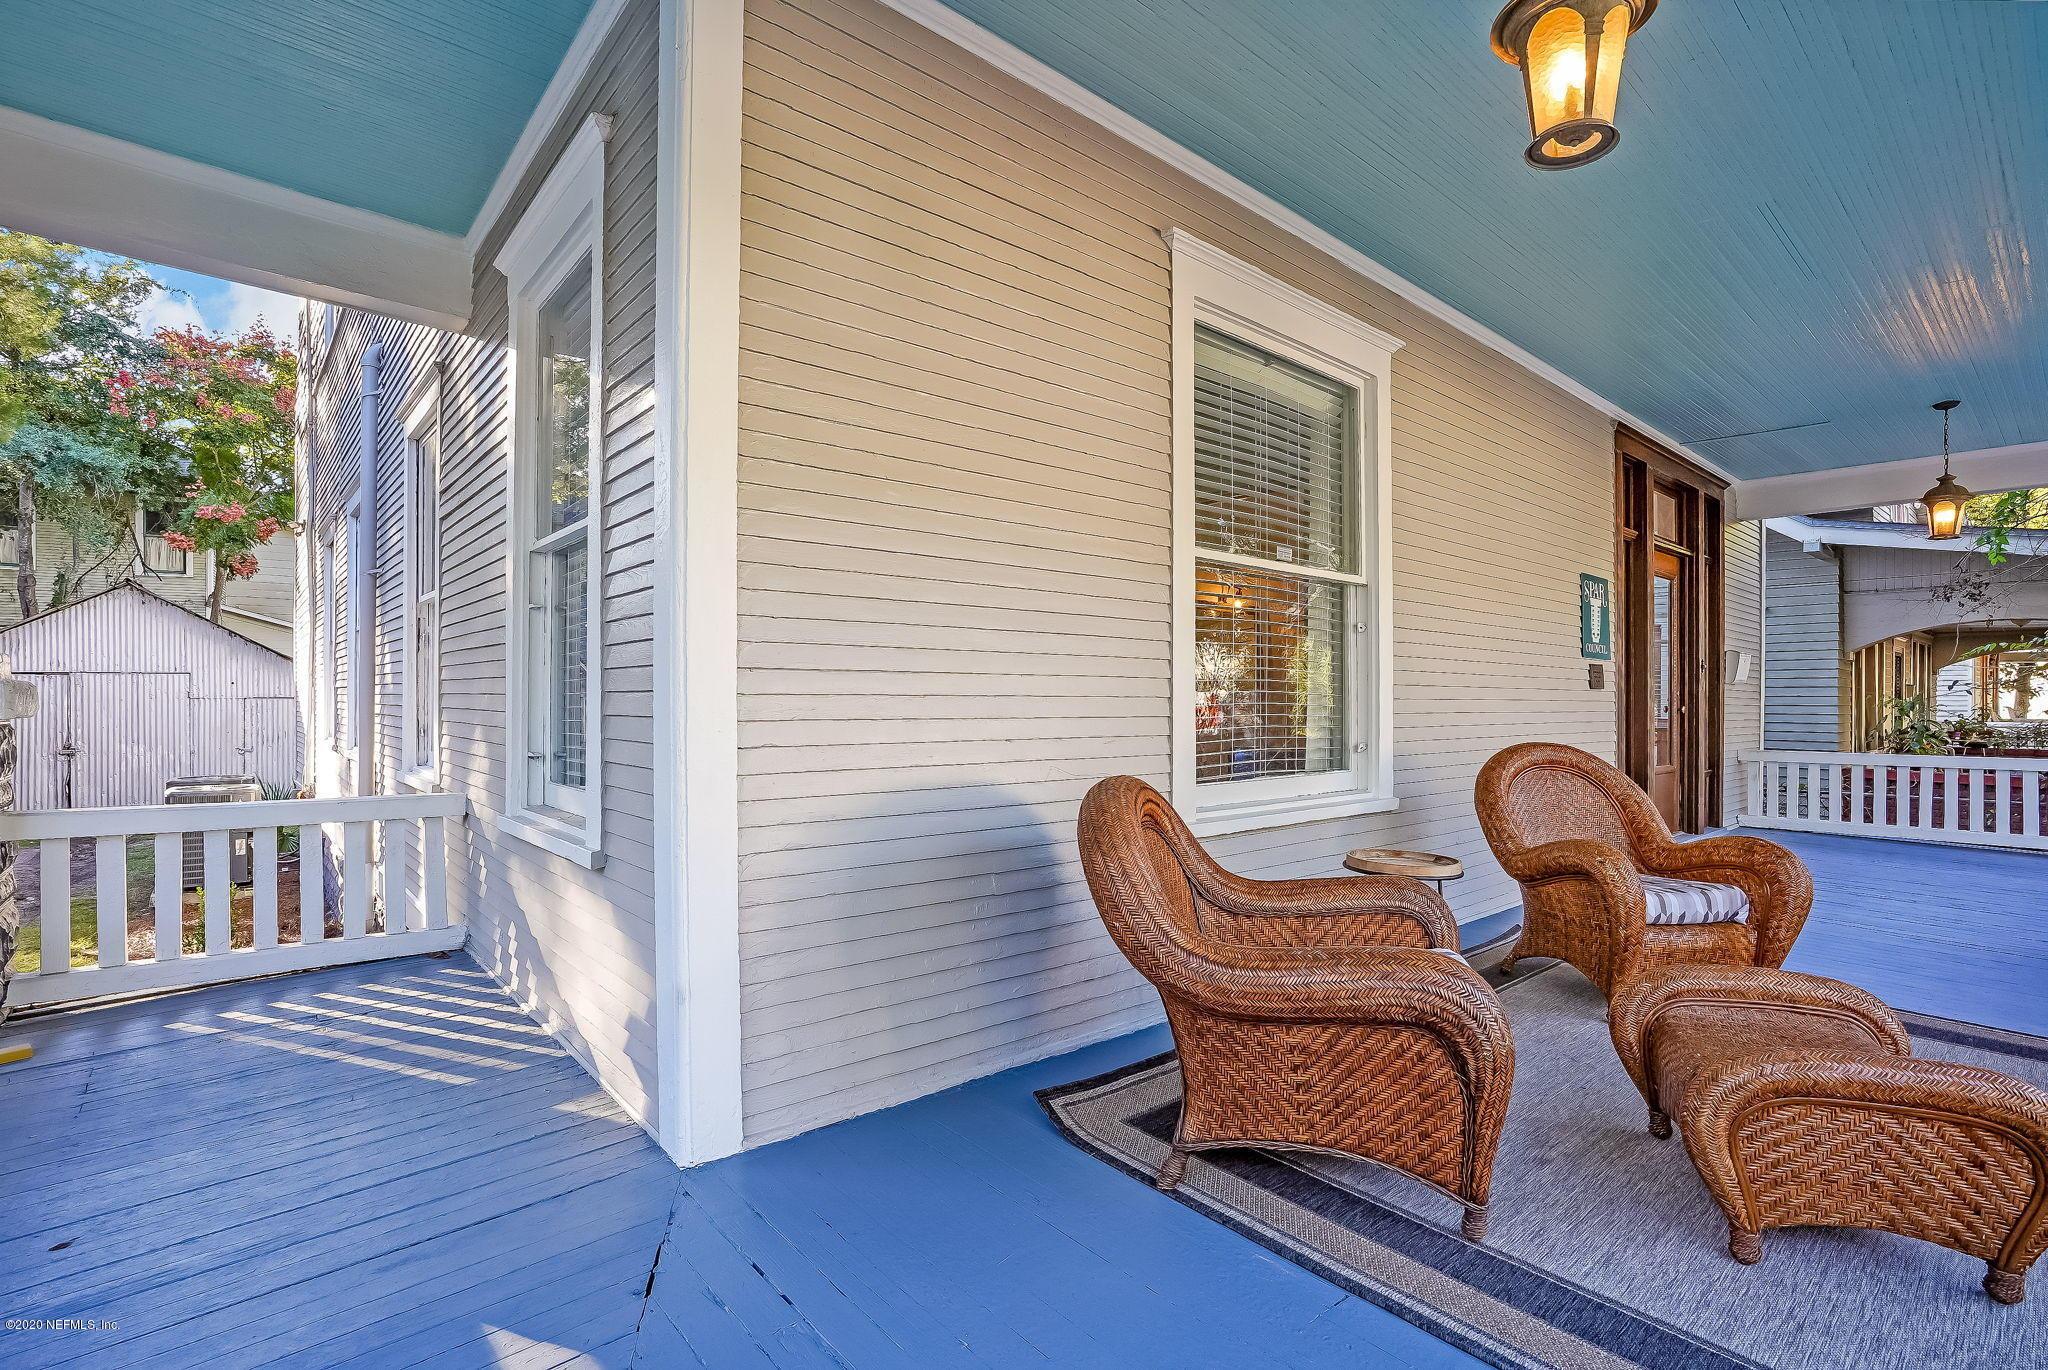 2014 LAURA, JACKSONVILLE, FLORIDA 32206, 3 Bedrooms Bedrooms, ,4 BathroomsBathrooms,Residential,For sale,LAURA,1078239